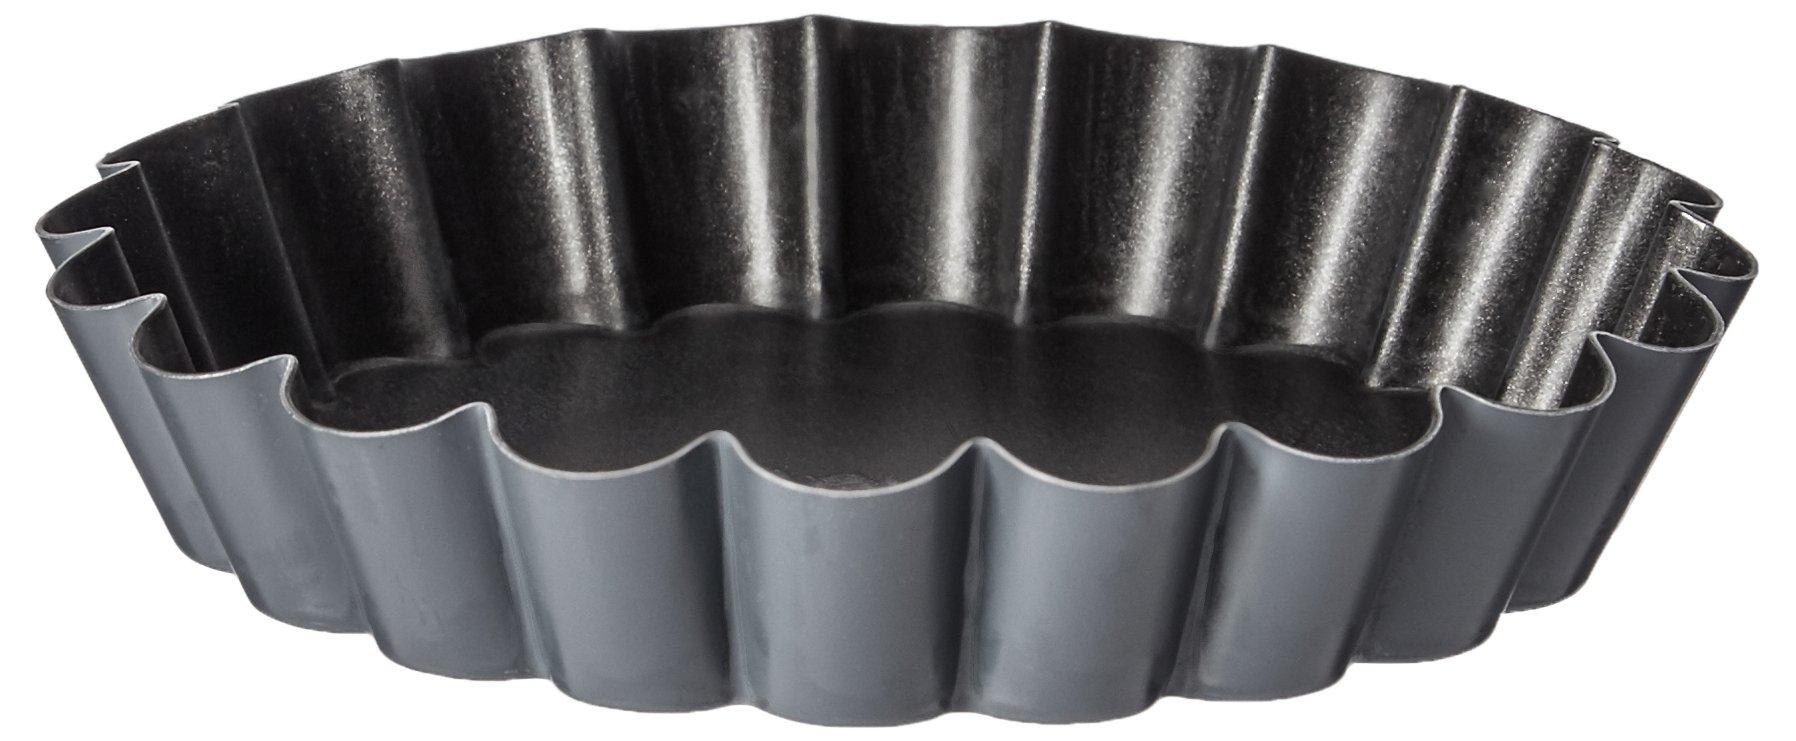 Matfer Bourgeat 332658 Exopan  Non-Stick Steel Scalloped Quiche